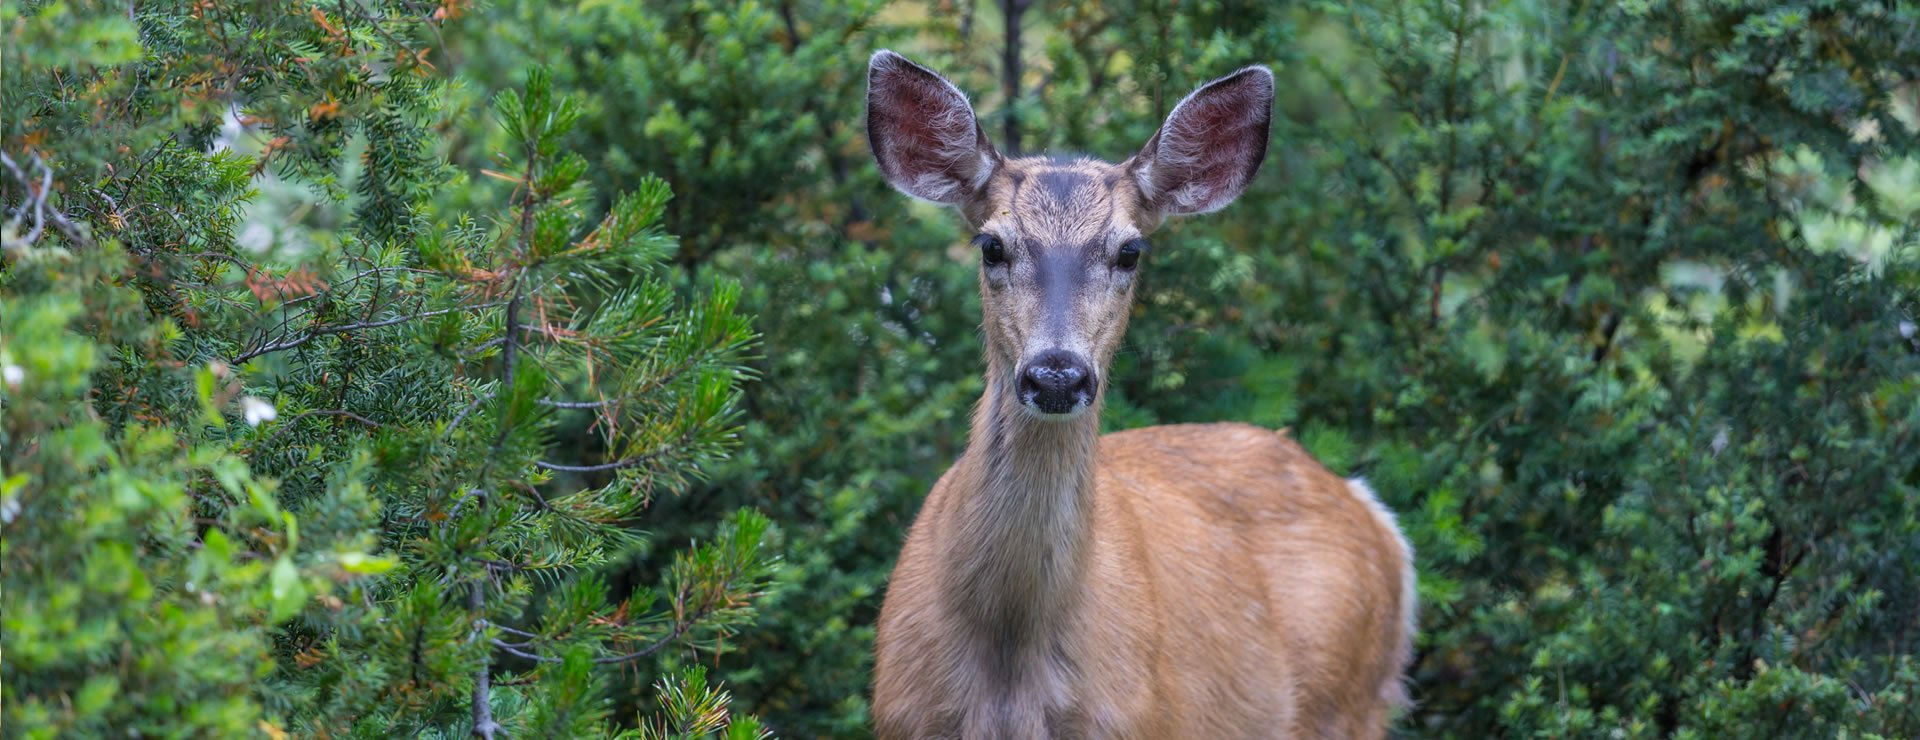 5 Hedge Plants That Deter Deer